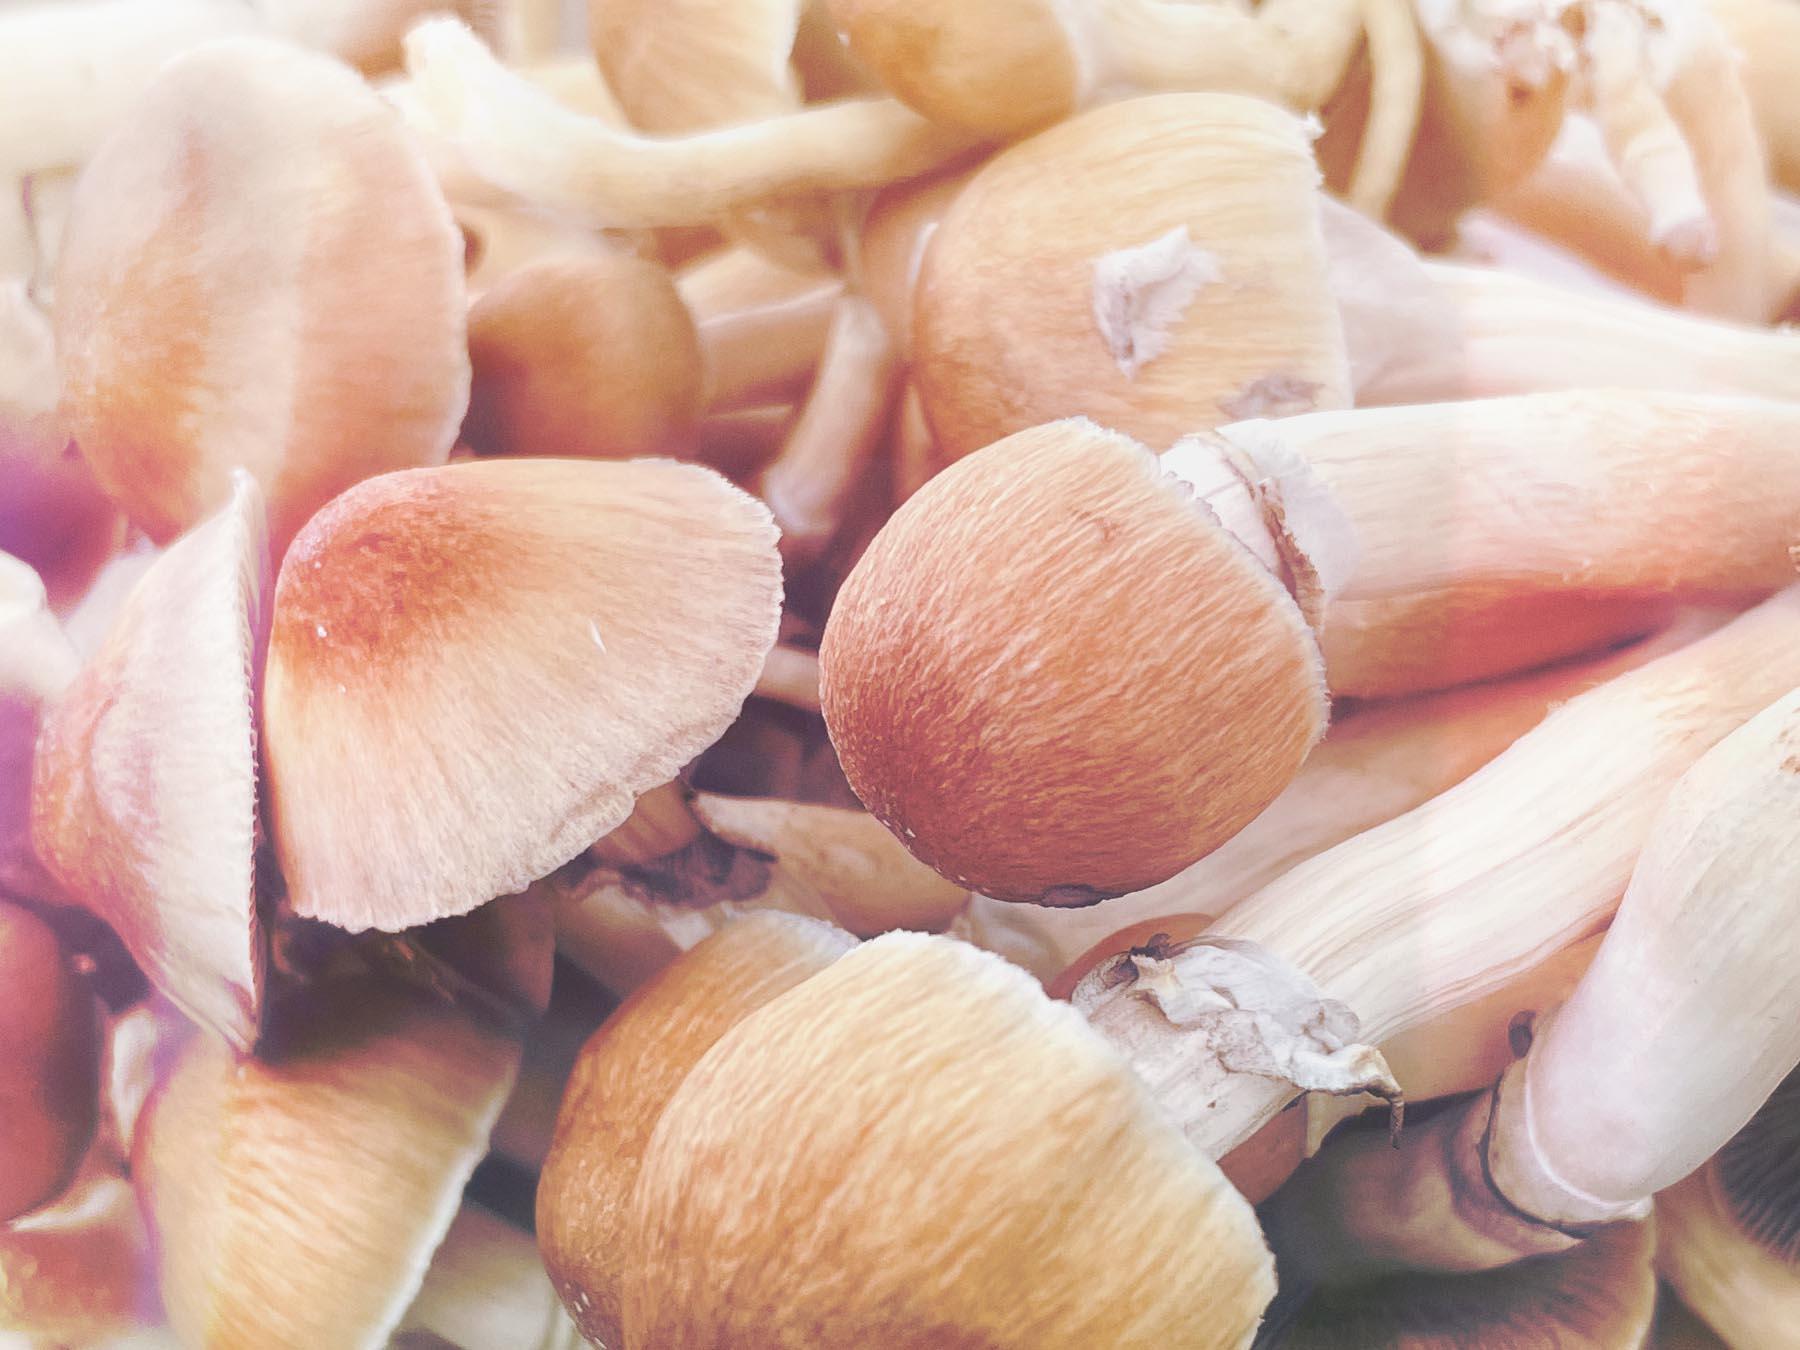 distorted photo of magic mushrooms close up